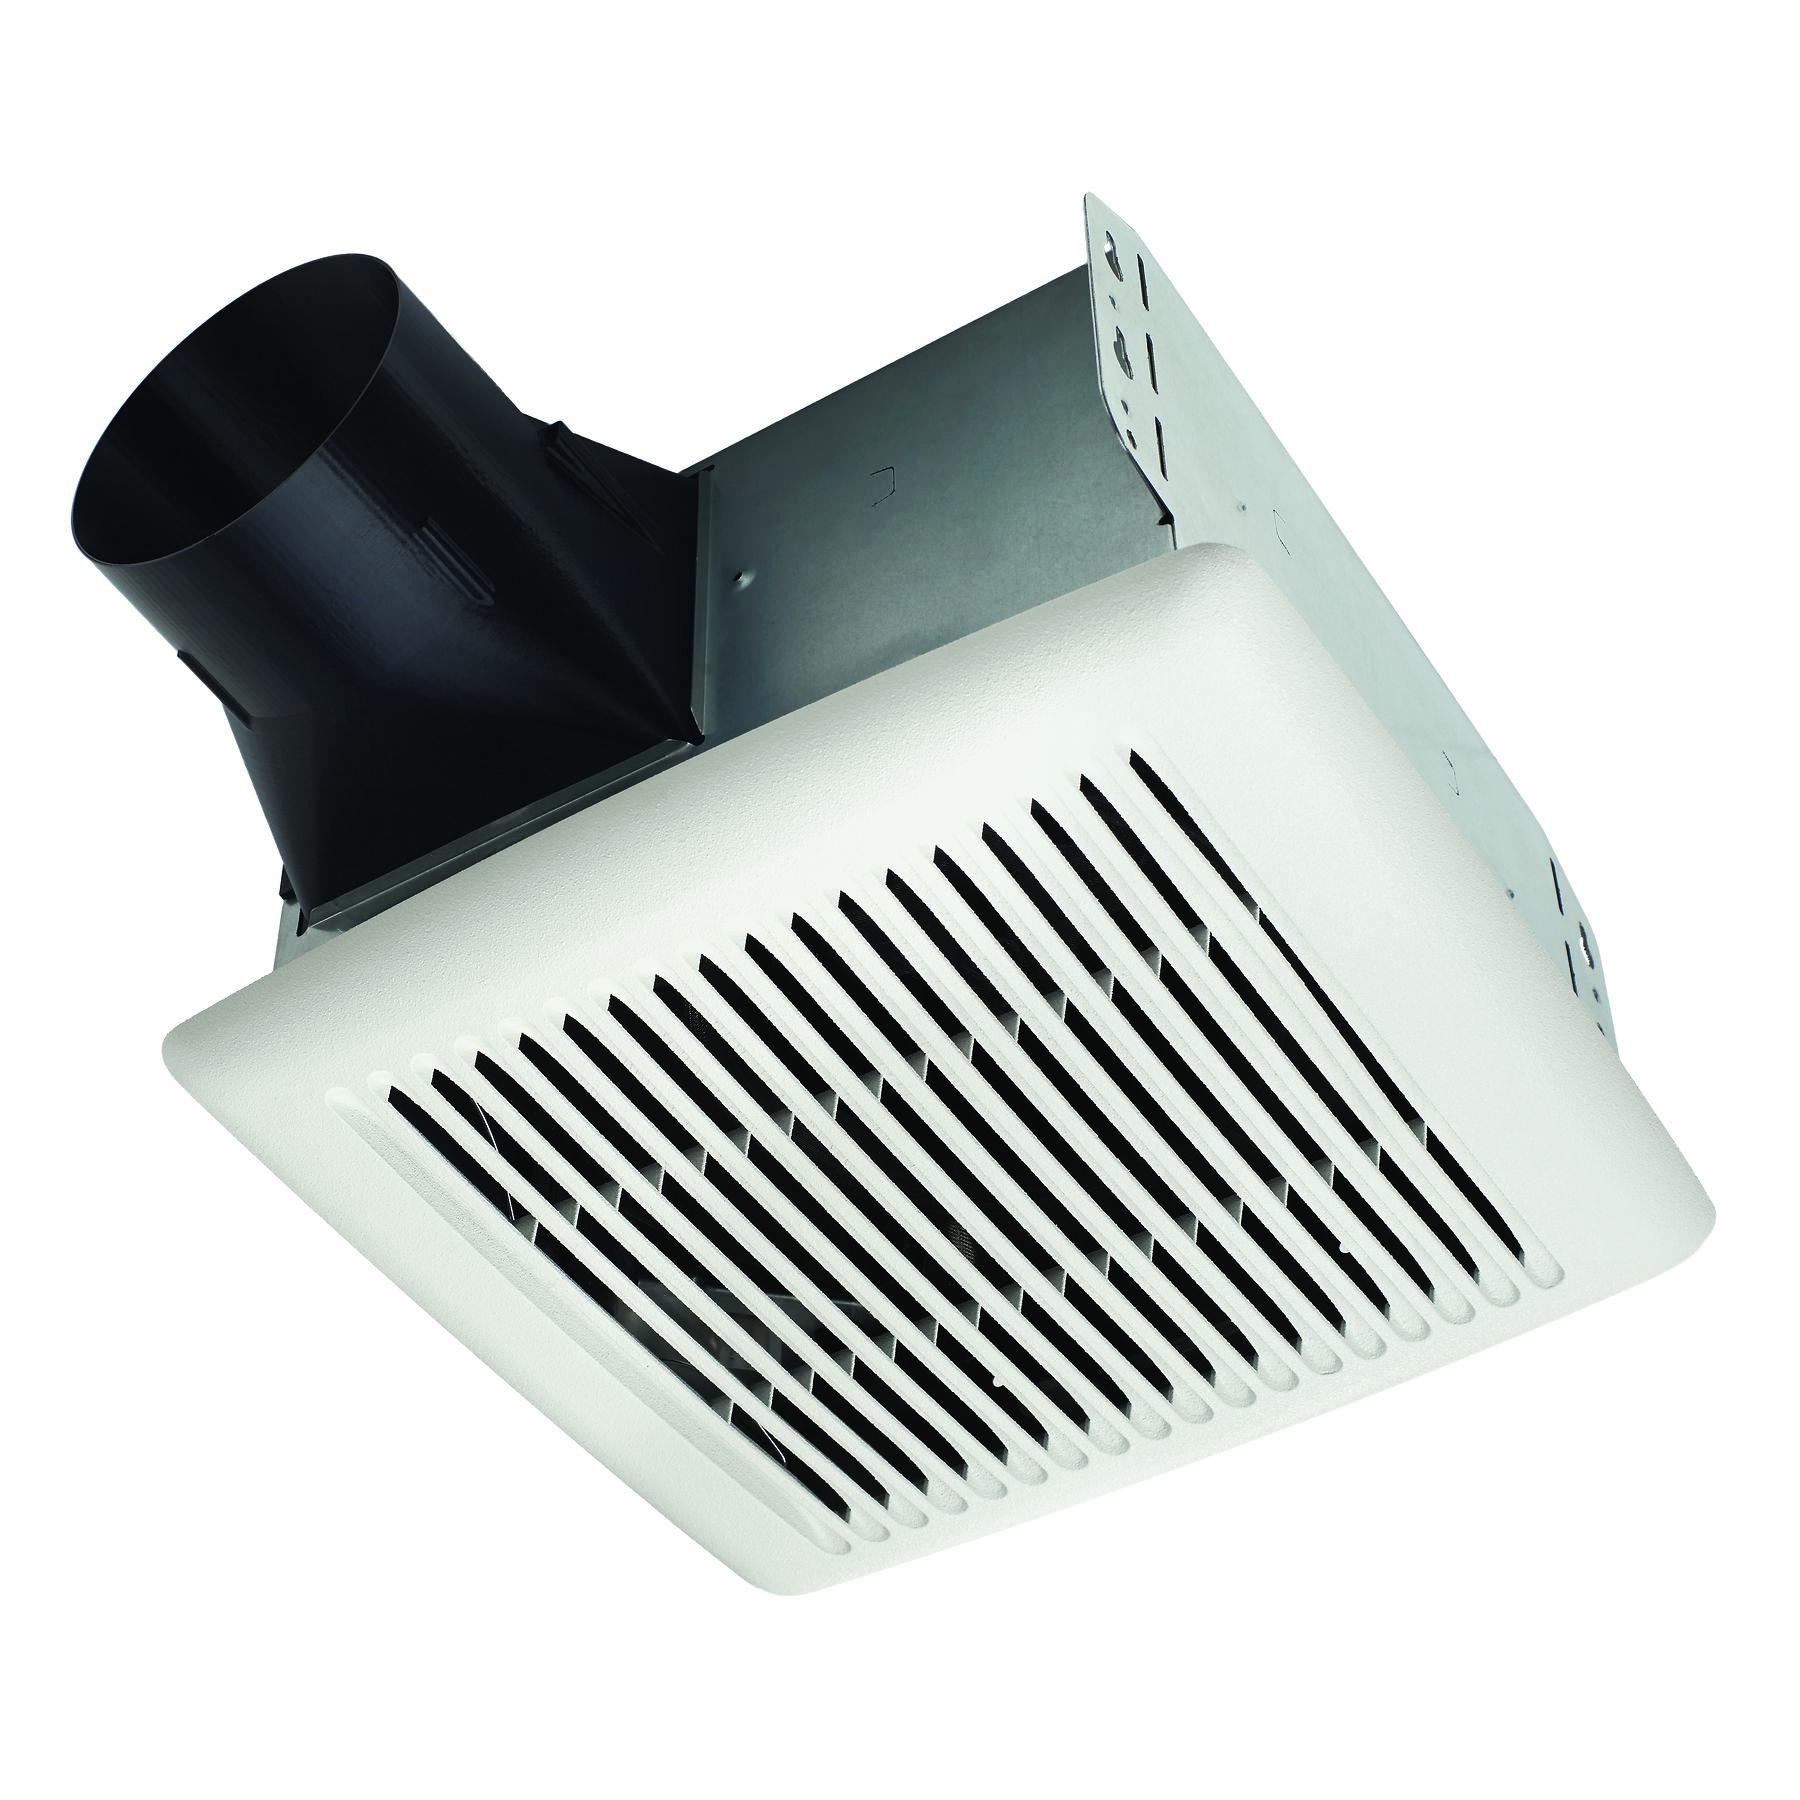 Ae50110dc Broan Bathroom Exhaust Fan Energy Star 50 110 Cfm regarding proportions 1800 X 1800